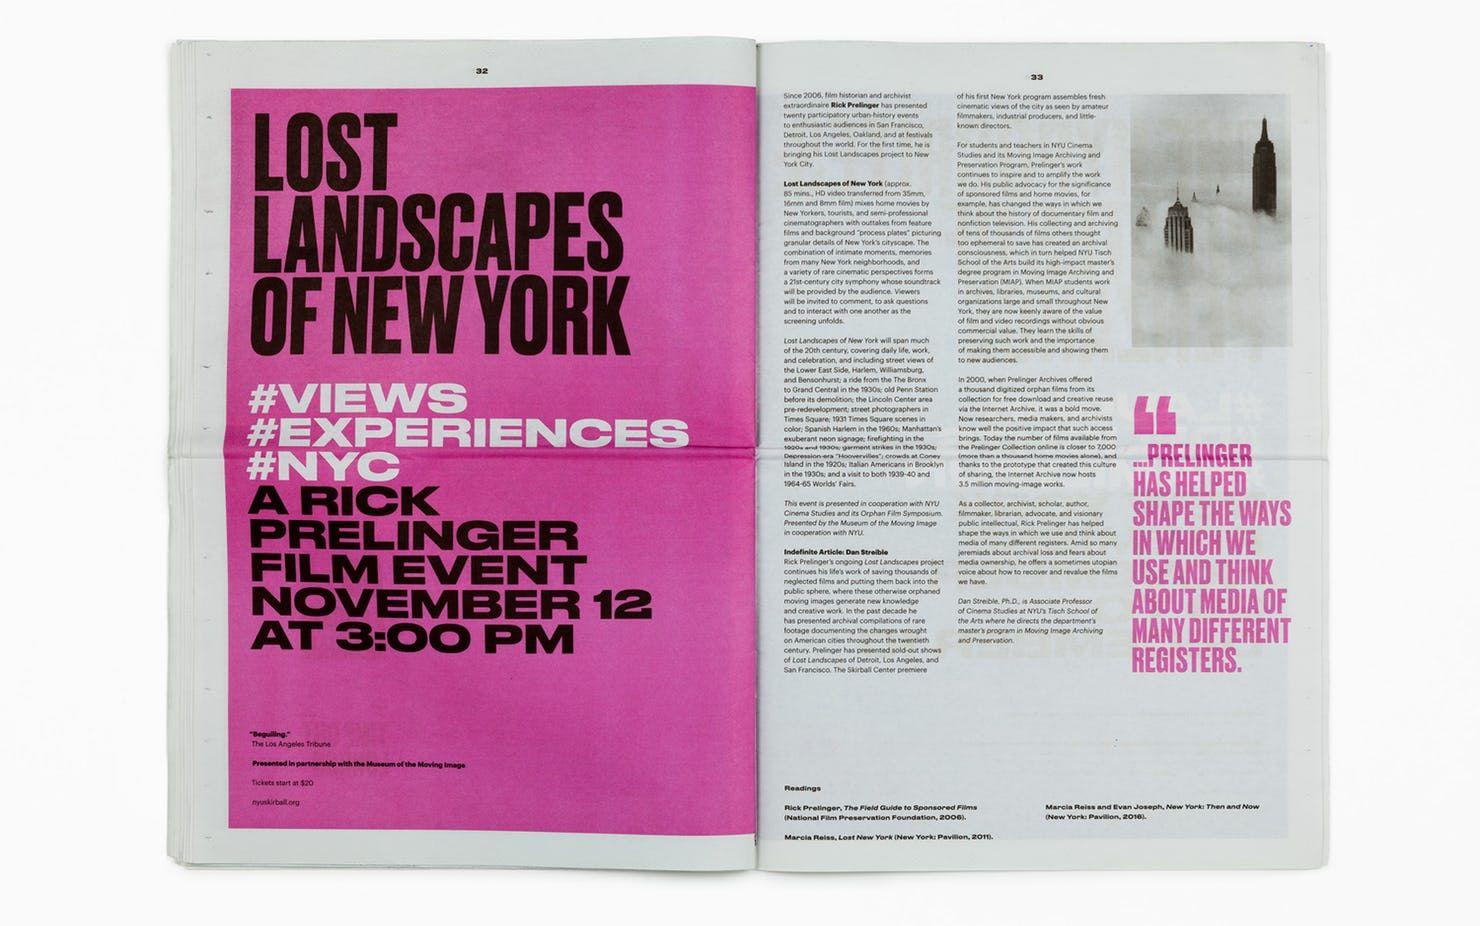 Pentagram Identity For Nyu Skirball Parsons School Of Design Michael Bierut Manhattan Art